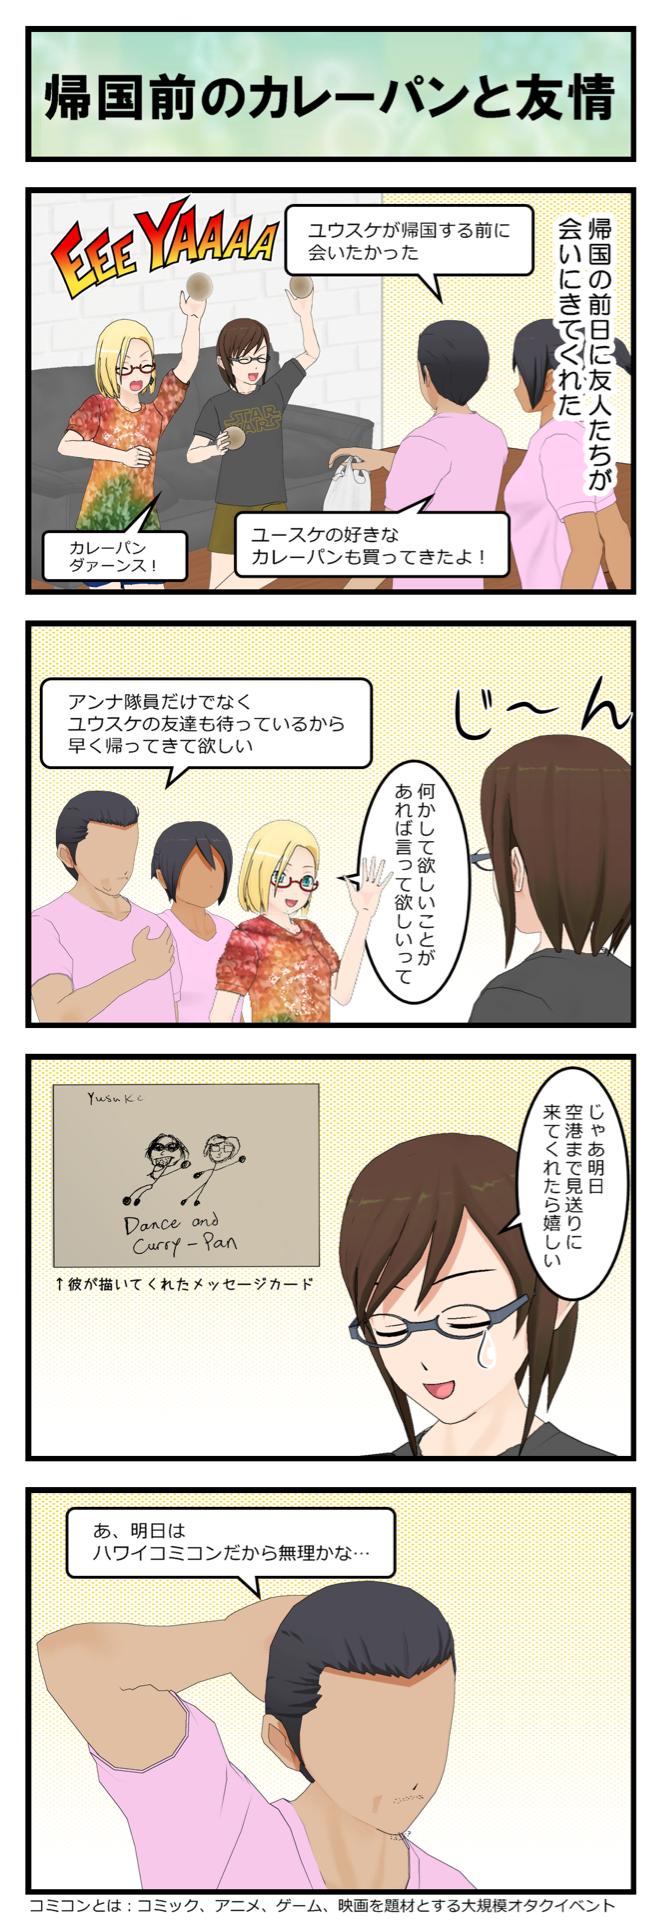 IMG_8249